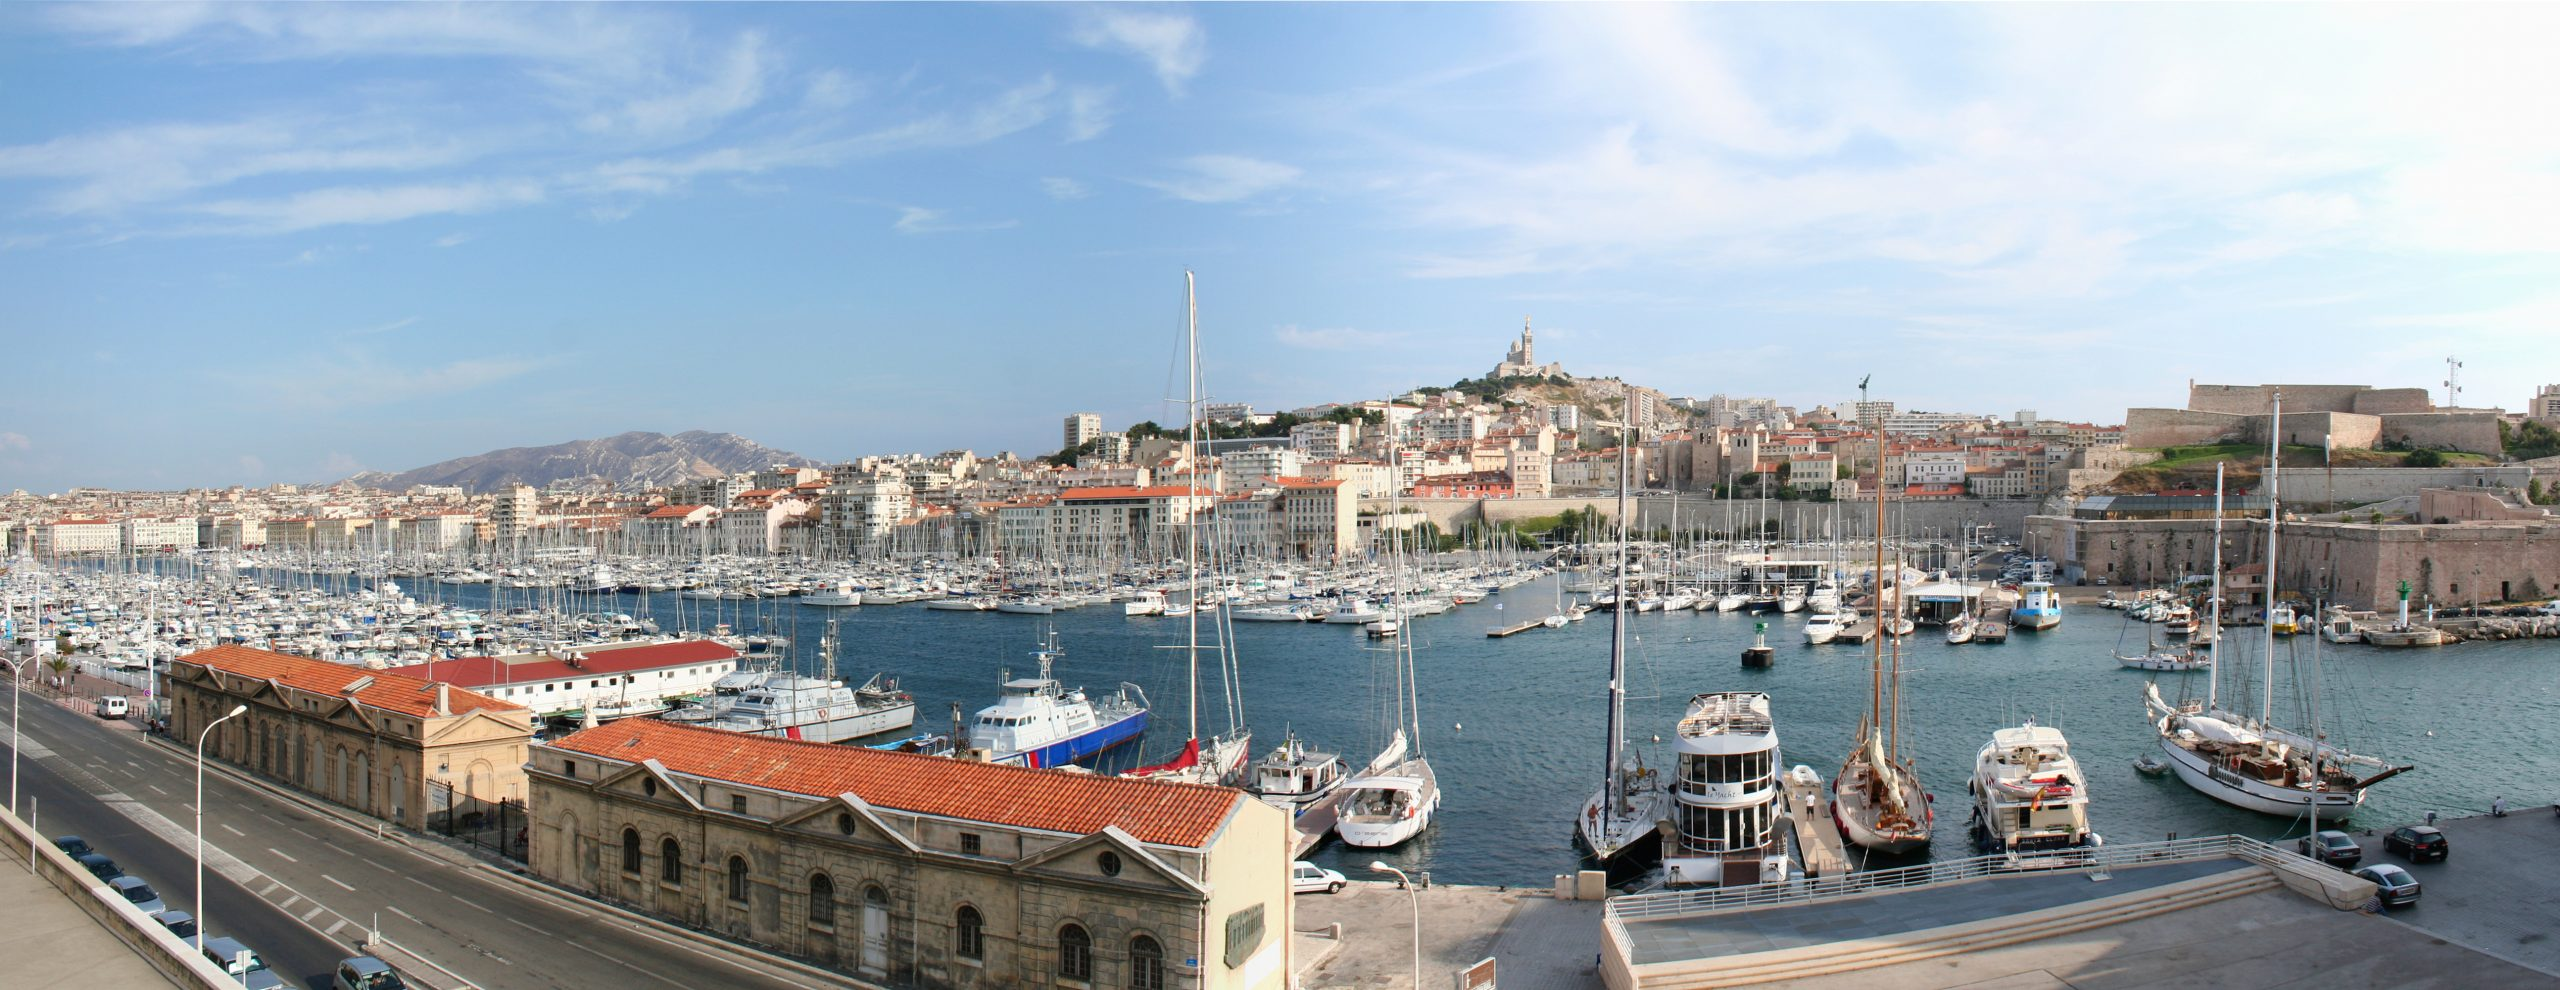 Old Port Of Marseille - Wikipedia intérieur Piscine Fos Sur Mer